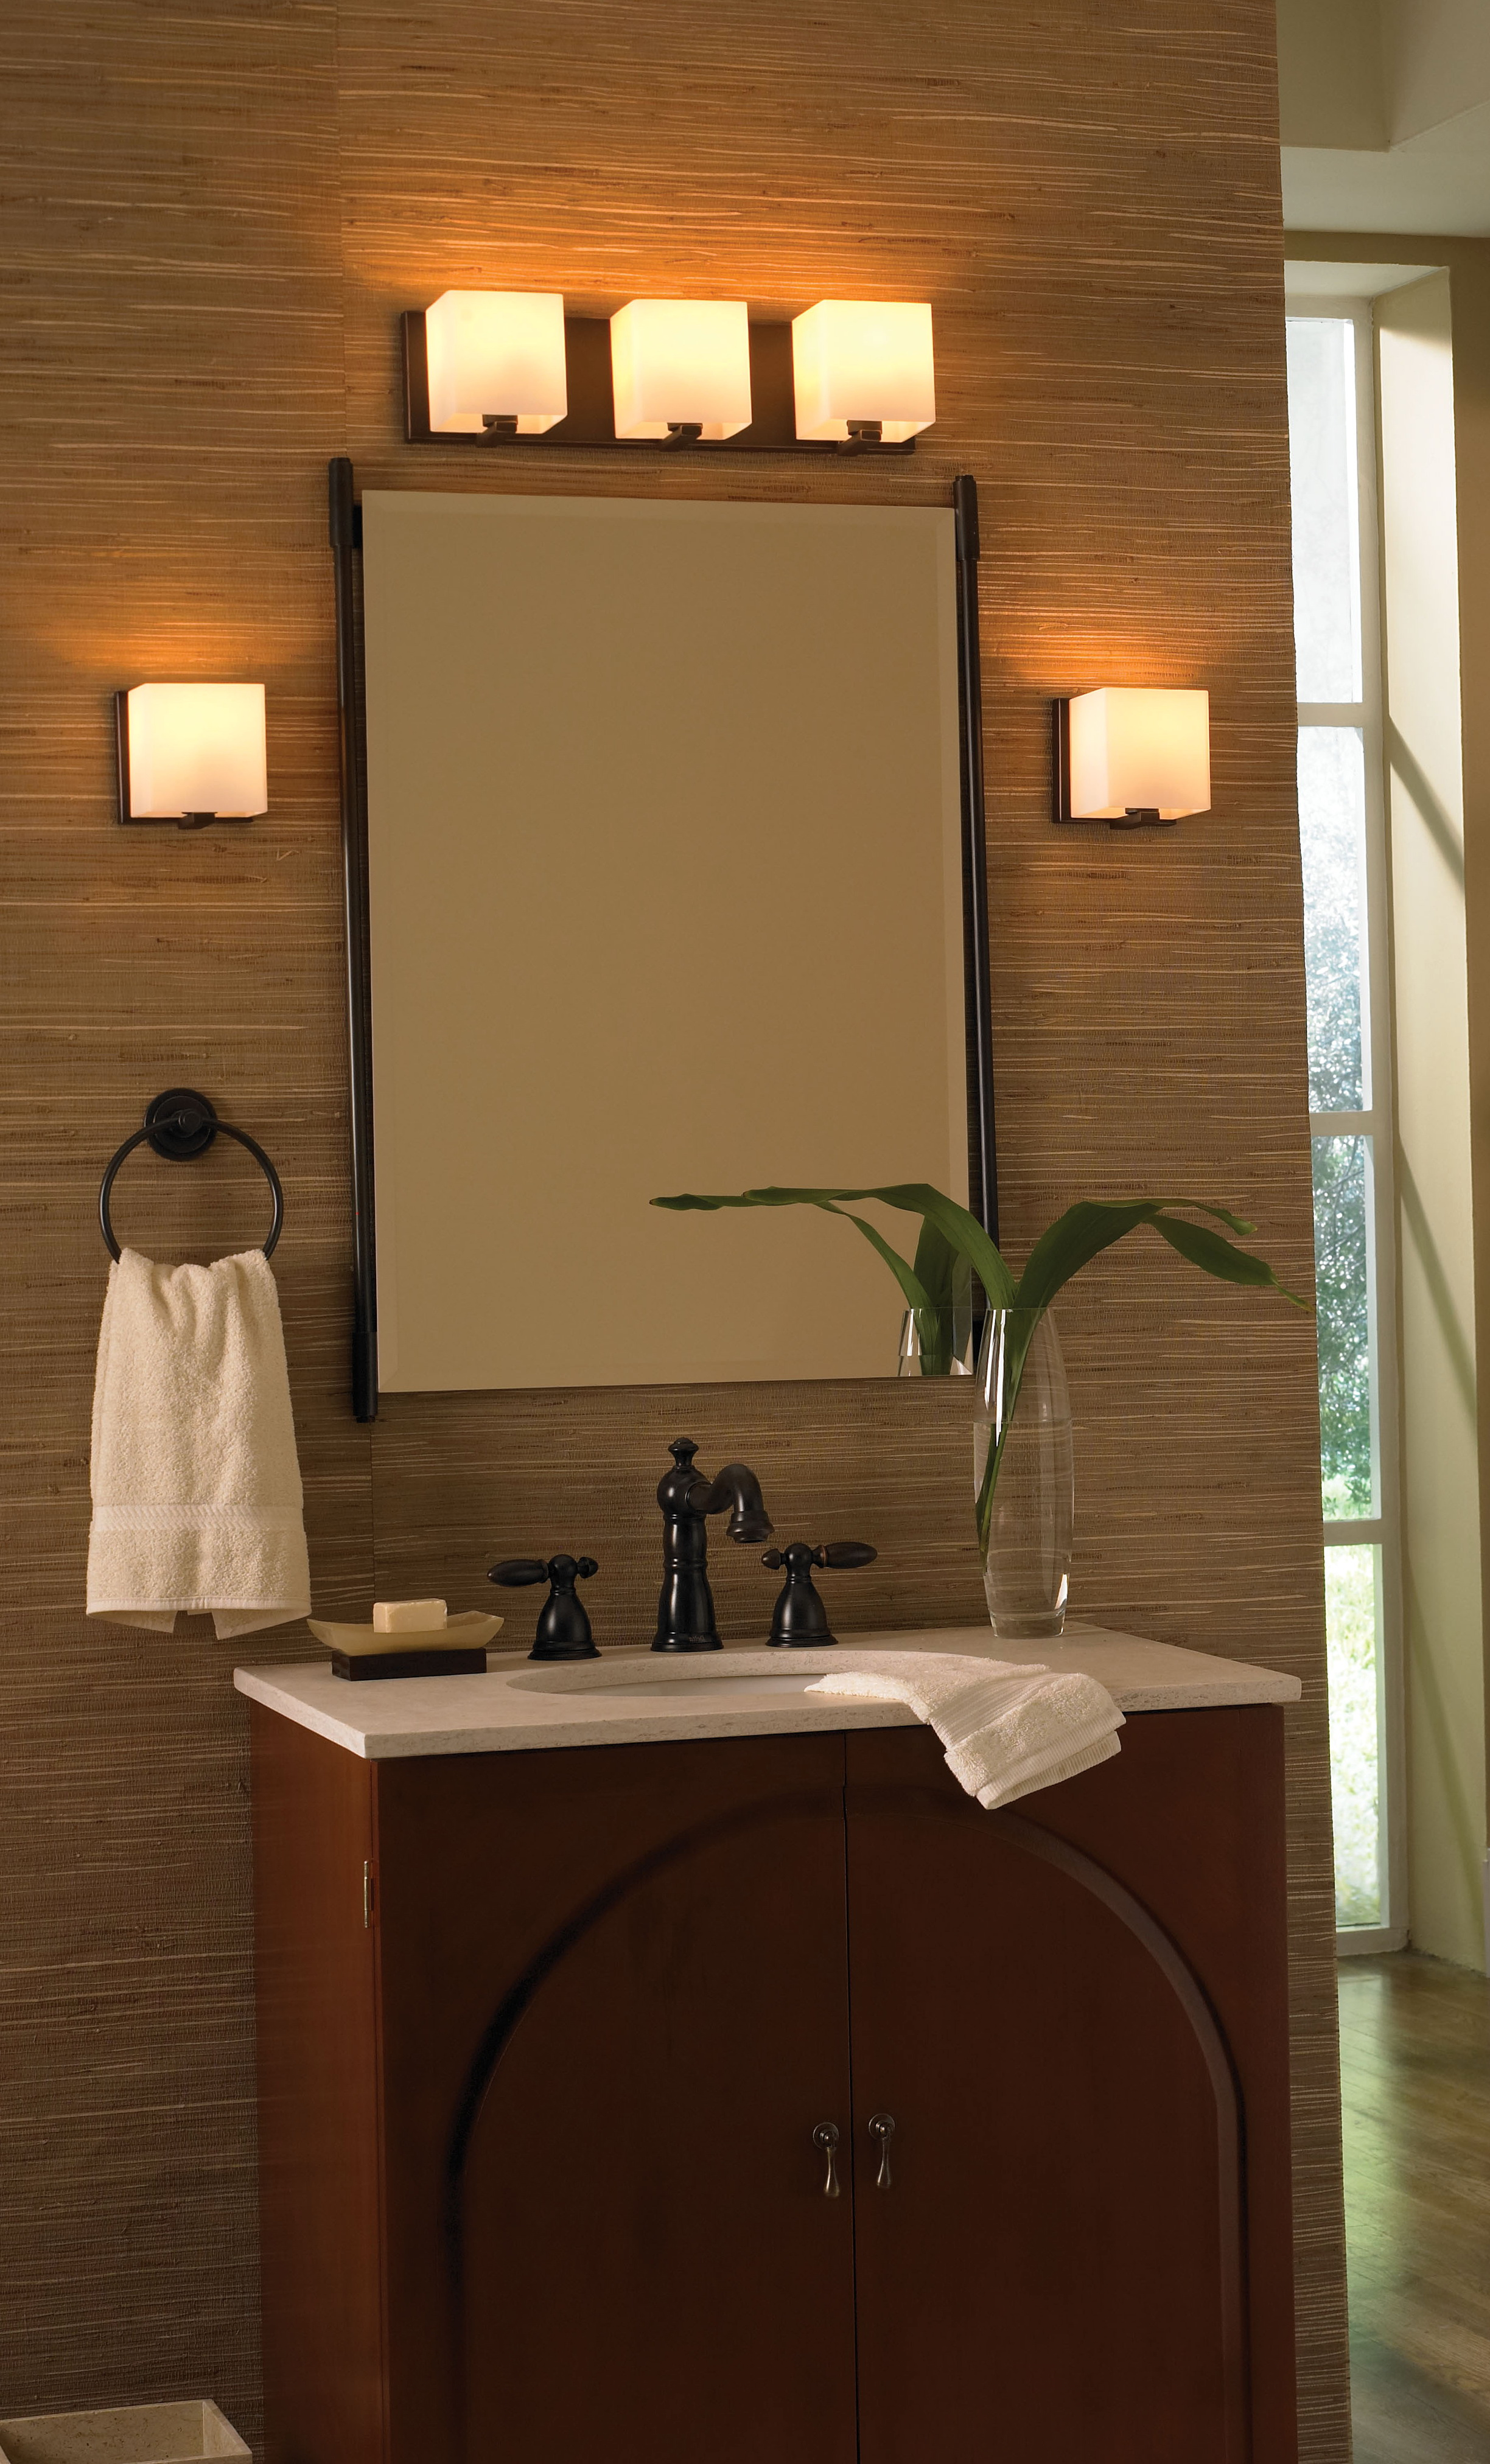 Bathroom vanity mirrors and lights